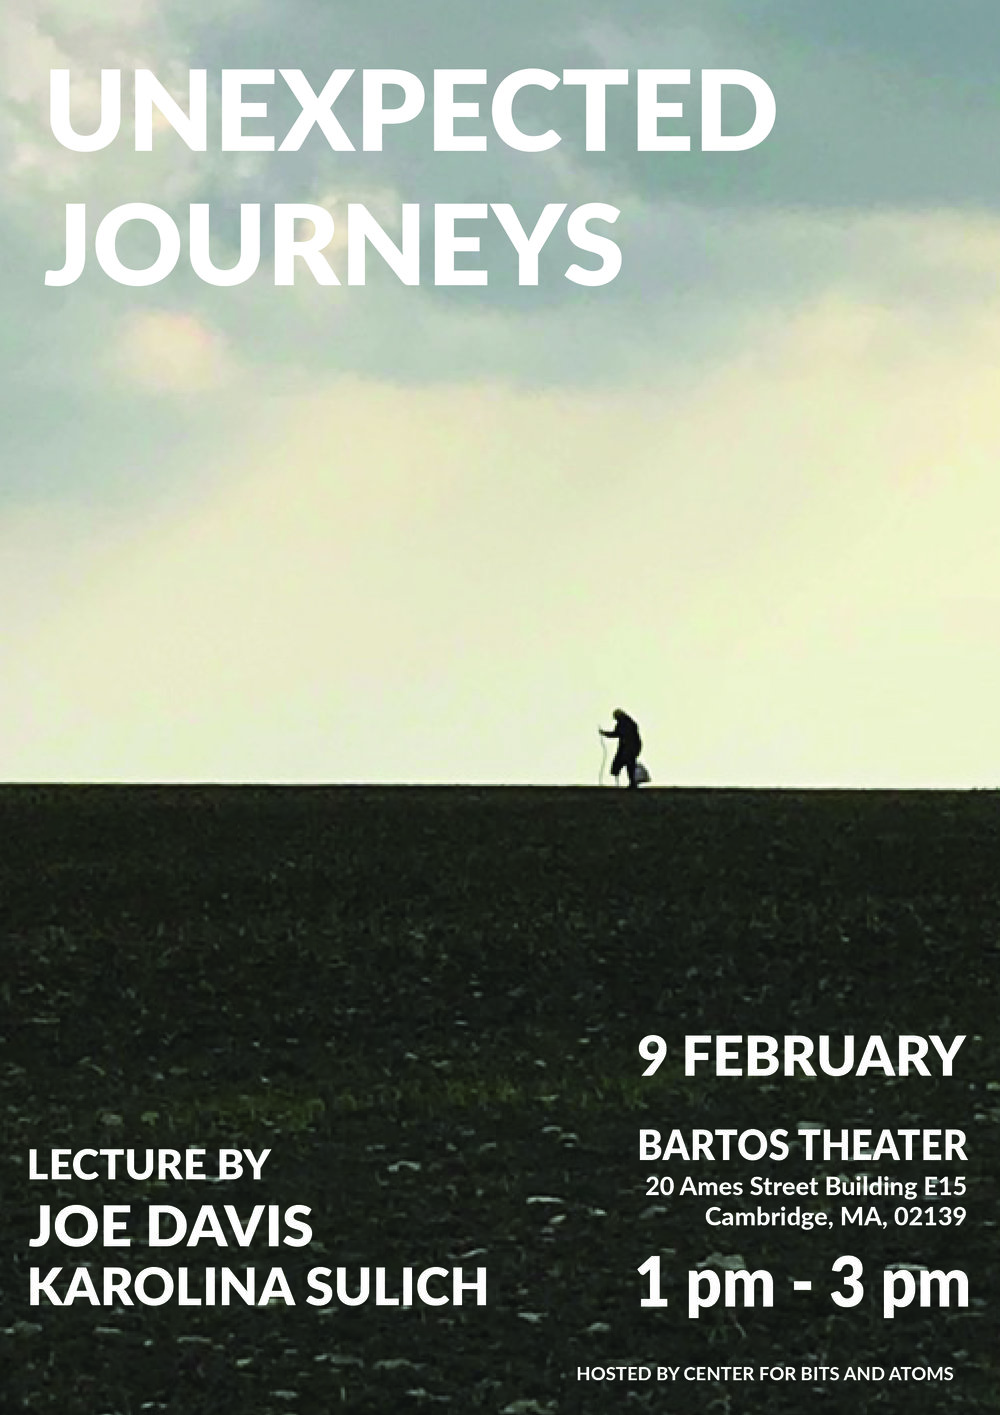 unexpected_journeys-02.jpg